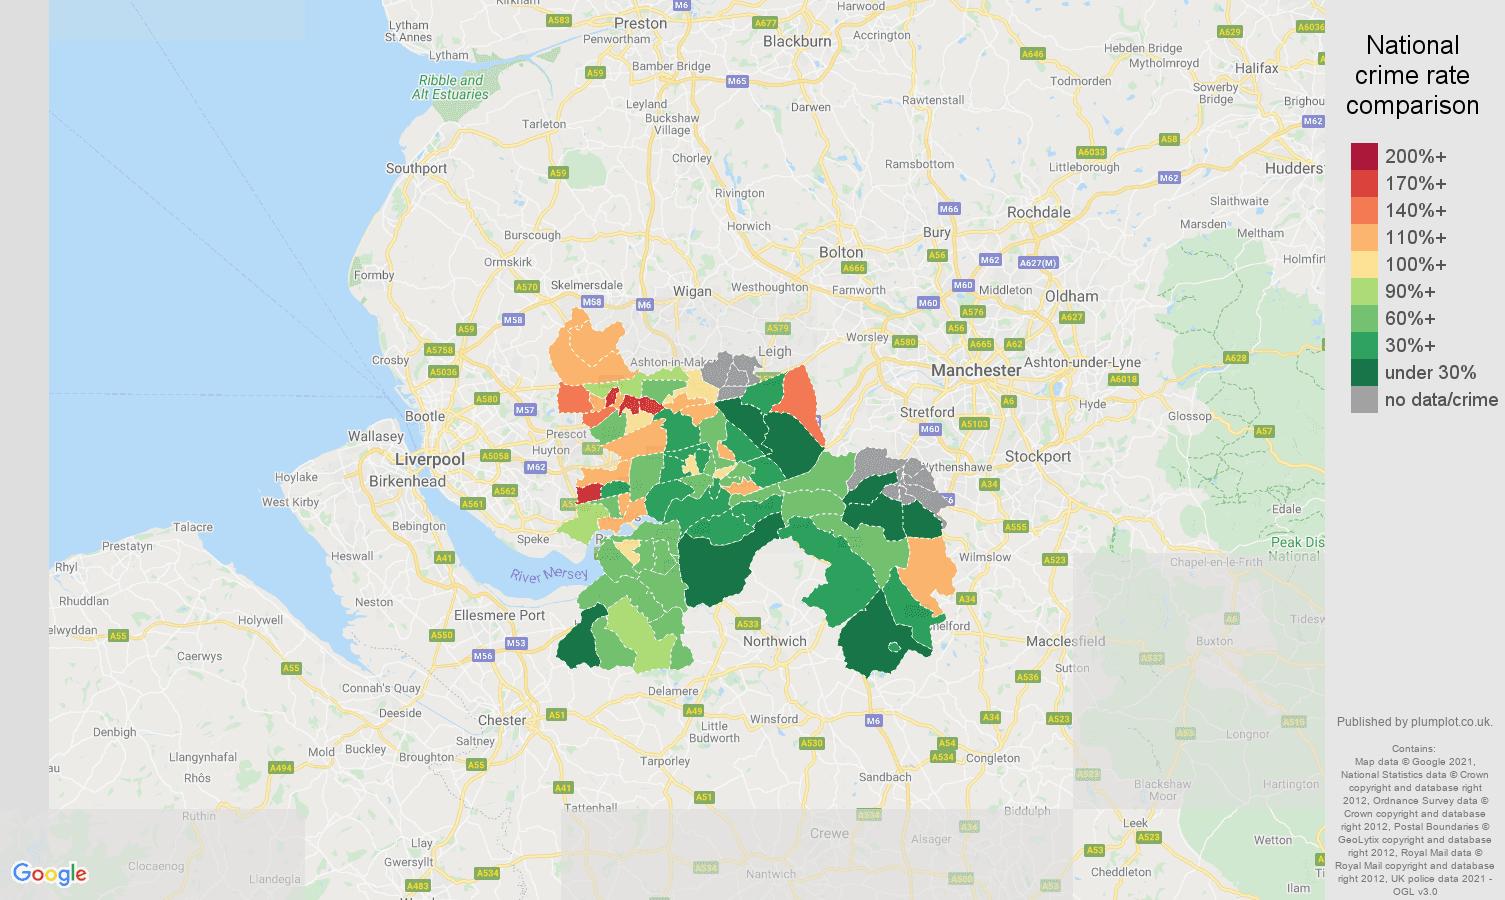 Warrington burglary crime rate comparison map